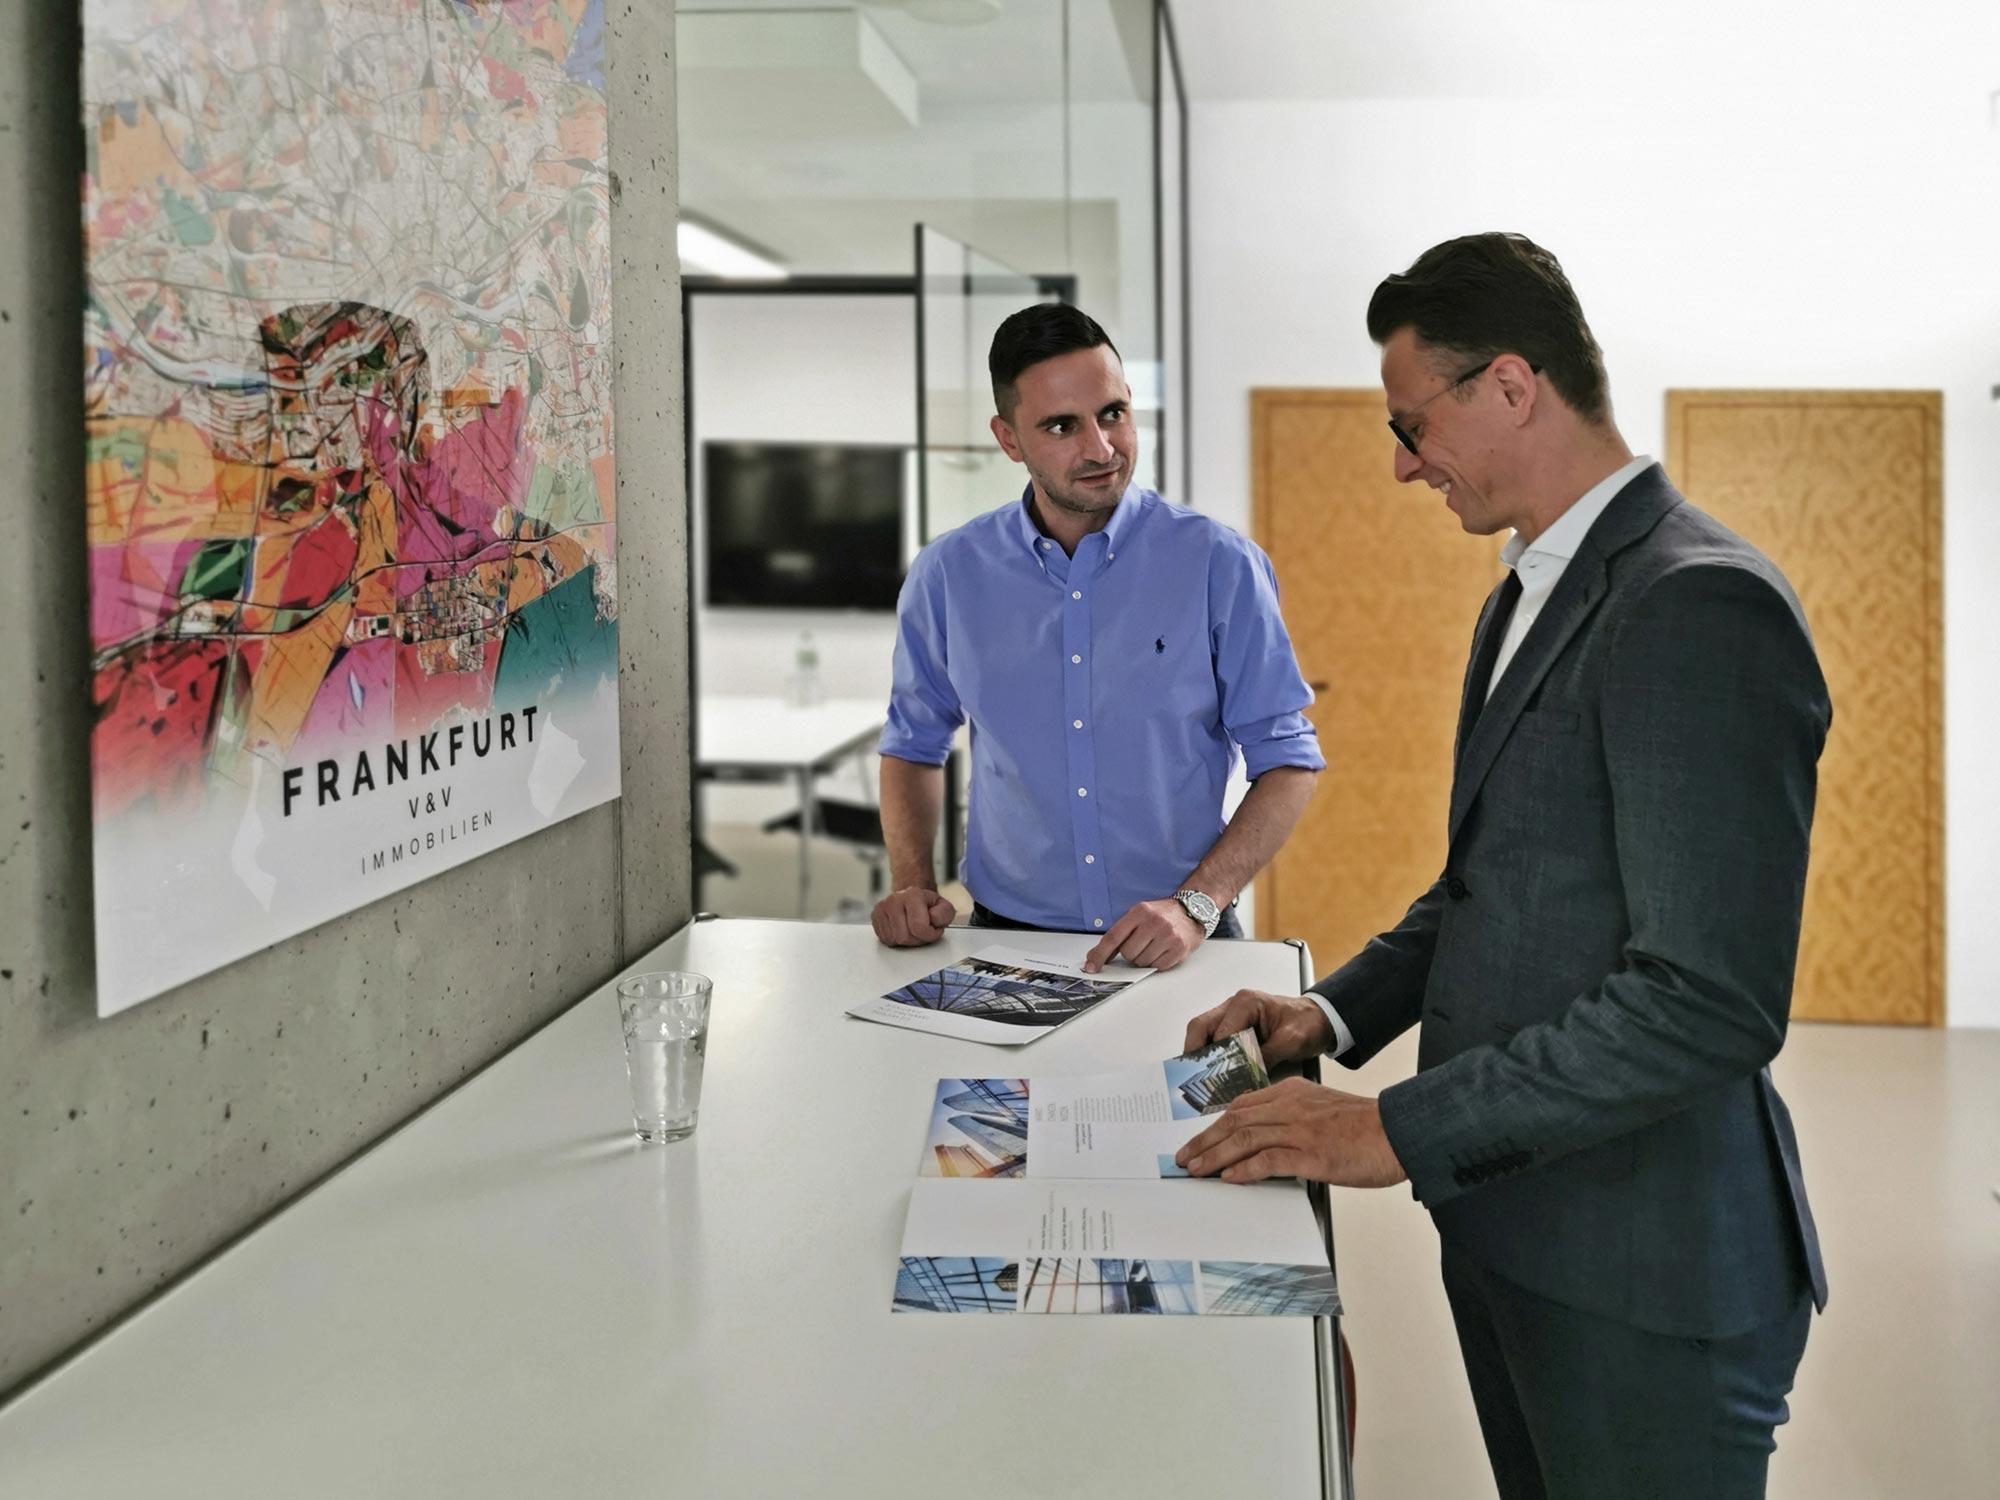 Immobilienberatung Frankfurt - Dean Vukovic im Gespräch